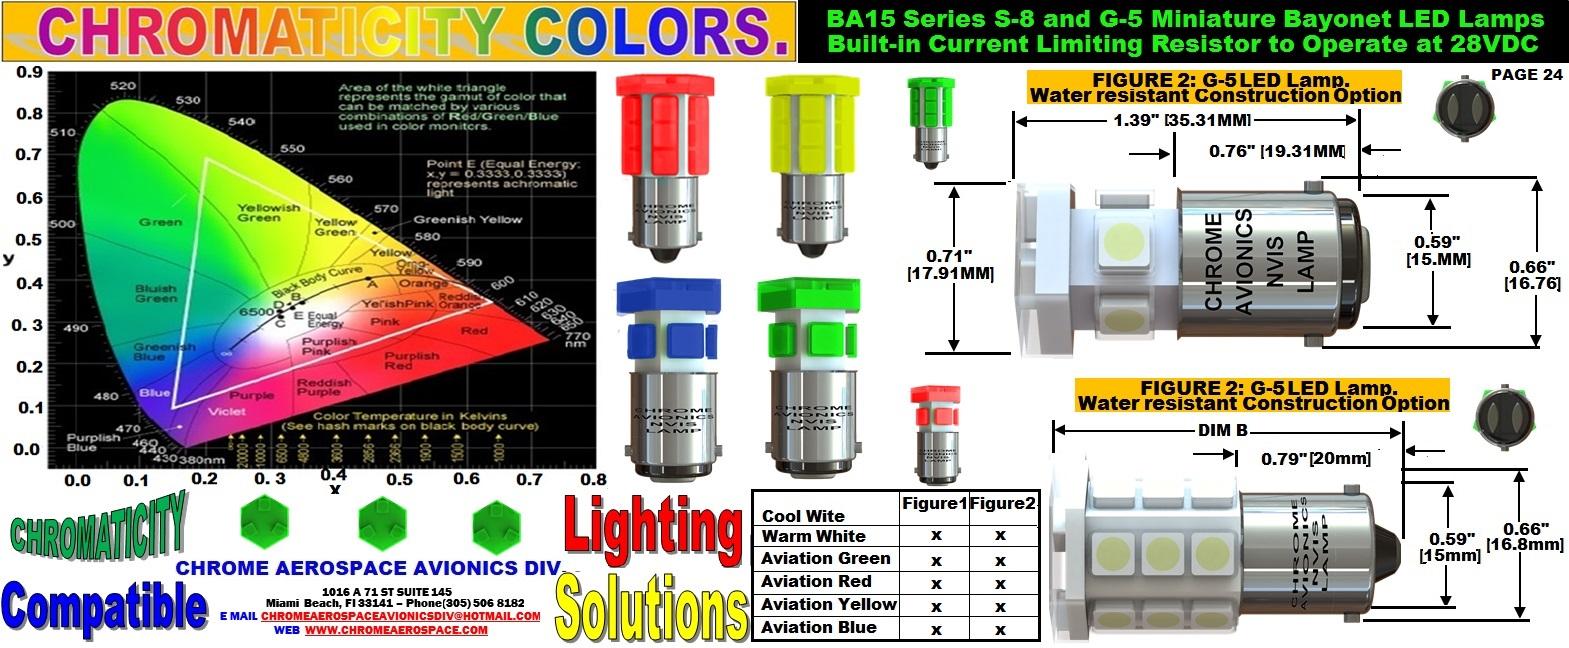 24 BA15 SERIES S-8 AND G-5 BAYONET MINIATURE BAYONET LED Lamps  5-4-18.jpg